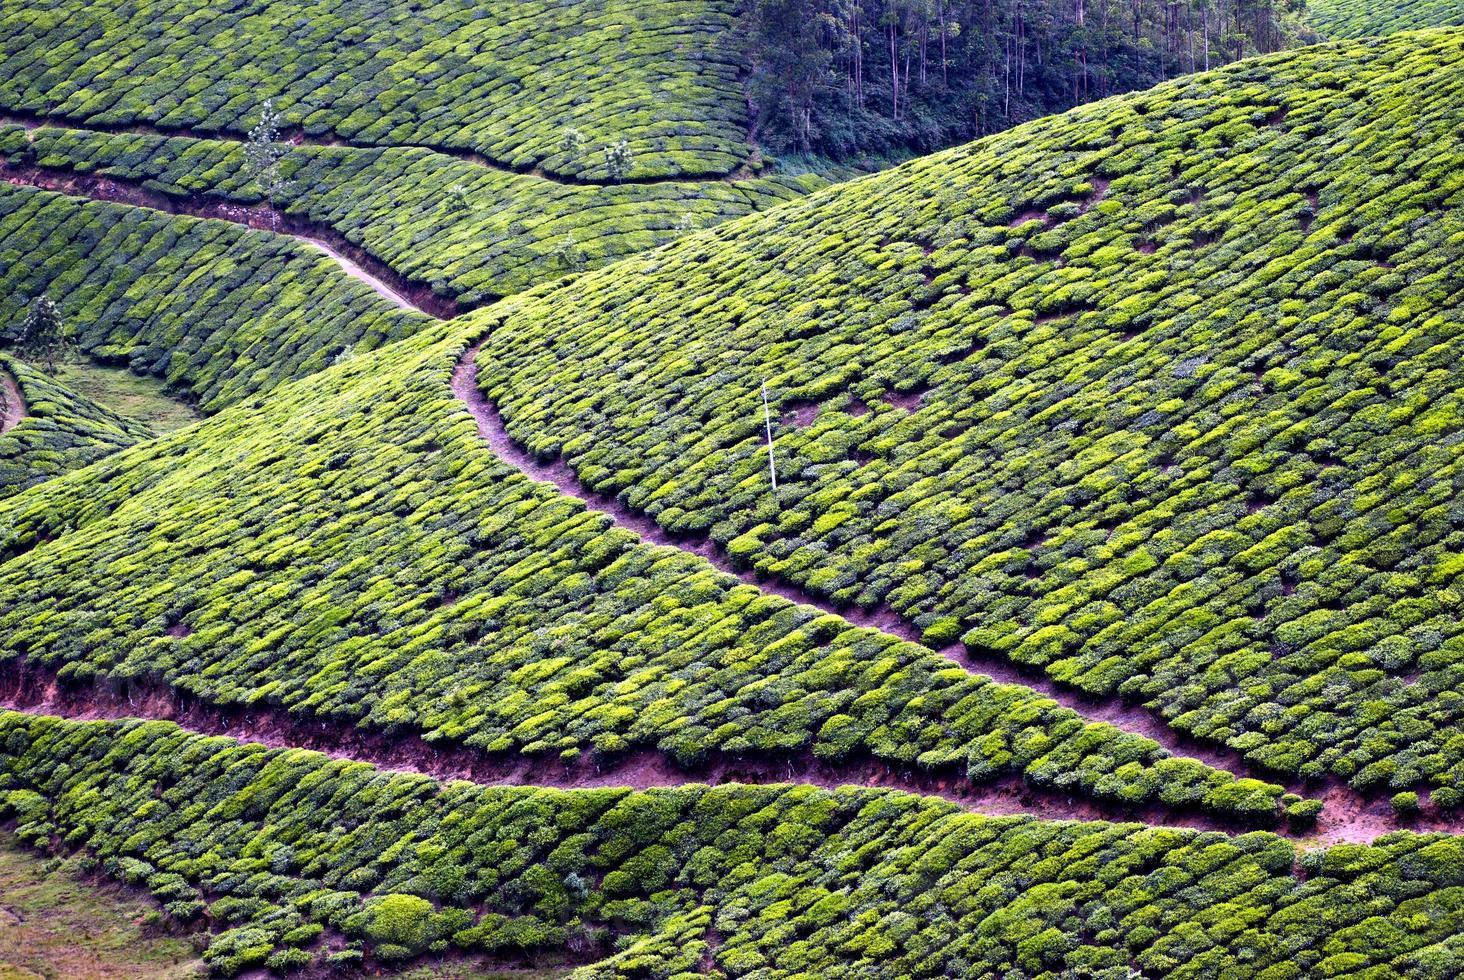 Teeplantage, Teeernte foto